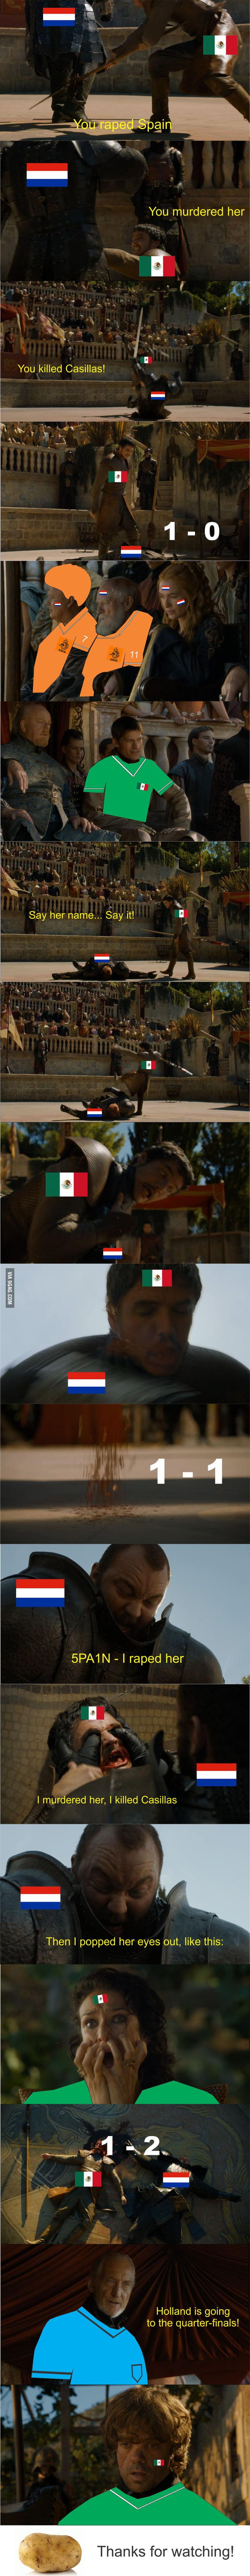 Last 16: Netherlands (1B) vs Mexico (2A) 29.06.14 18:00 - Page 6 A8WZqg3_700b